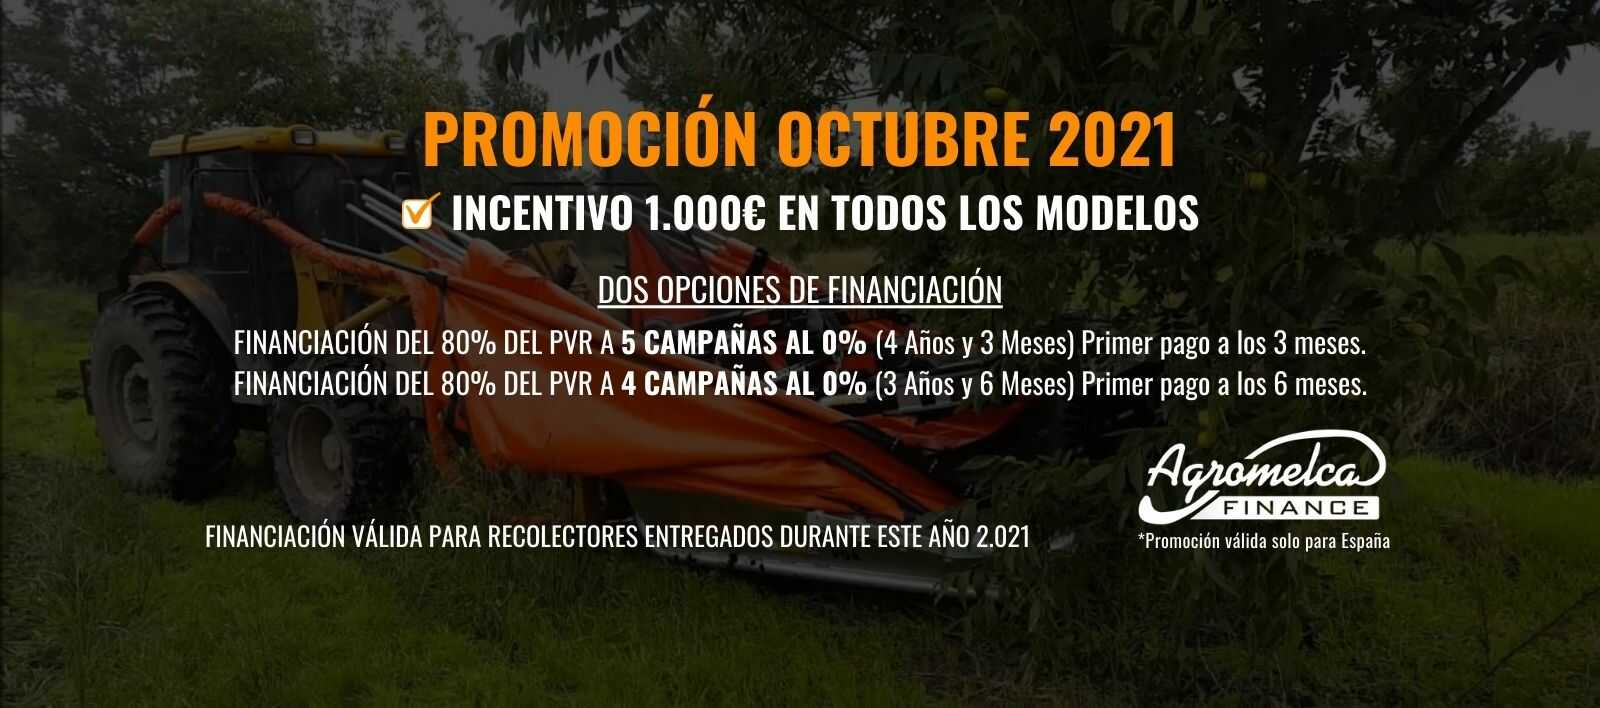 financiacion-octubre-2021-2_optimized